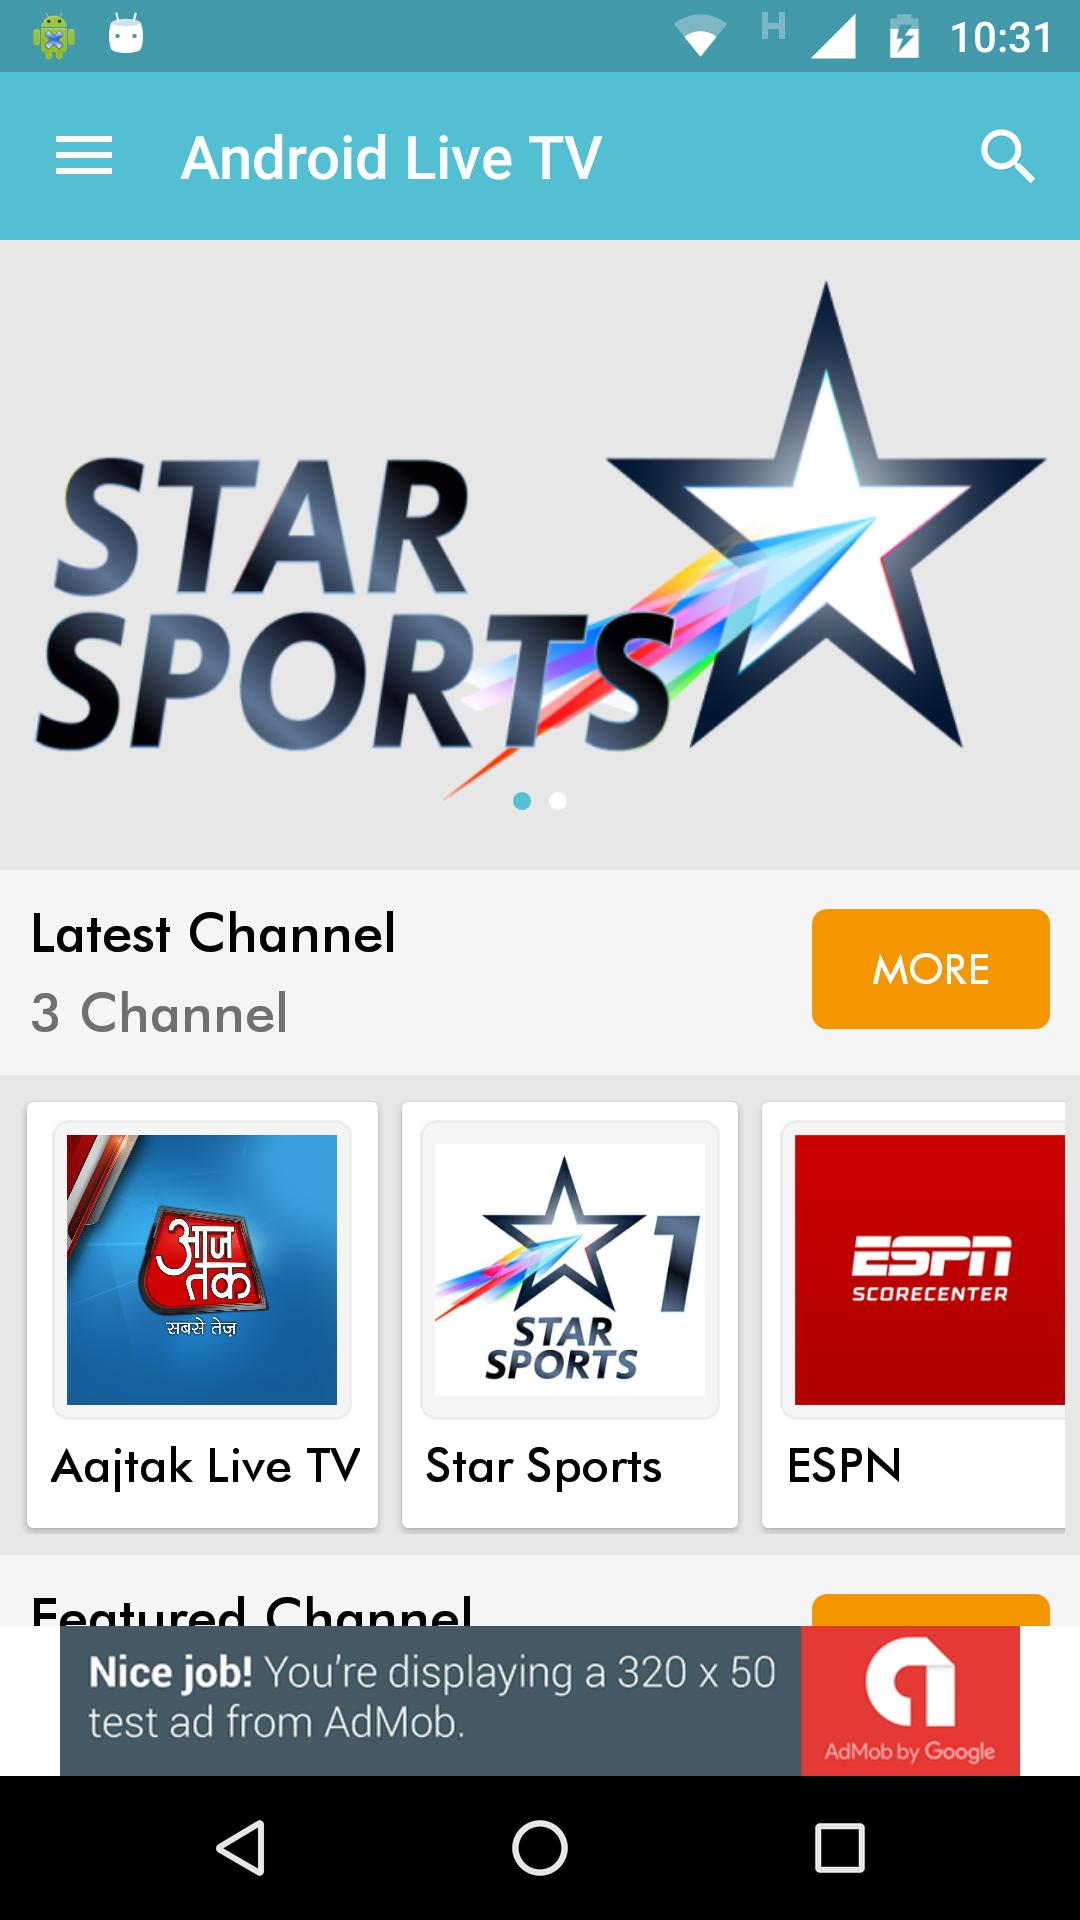 viavi top 5 android apps bundle tv radio wallpaper mp3 videos